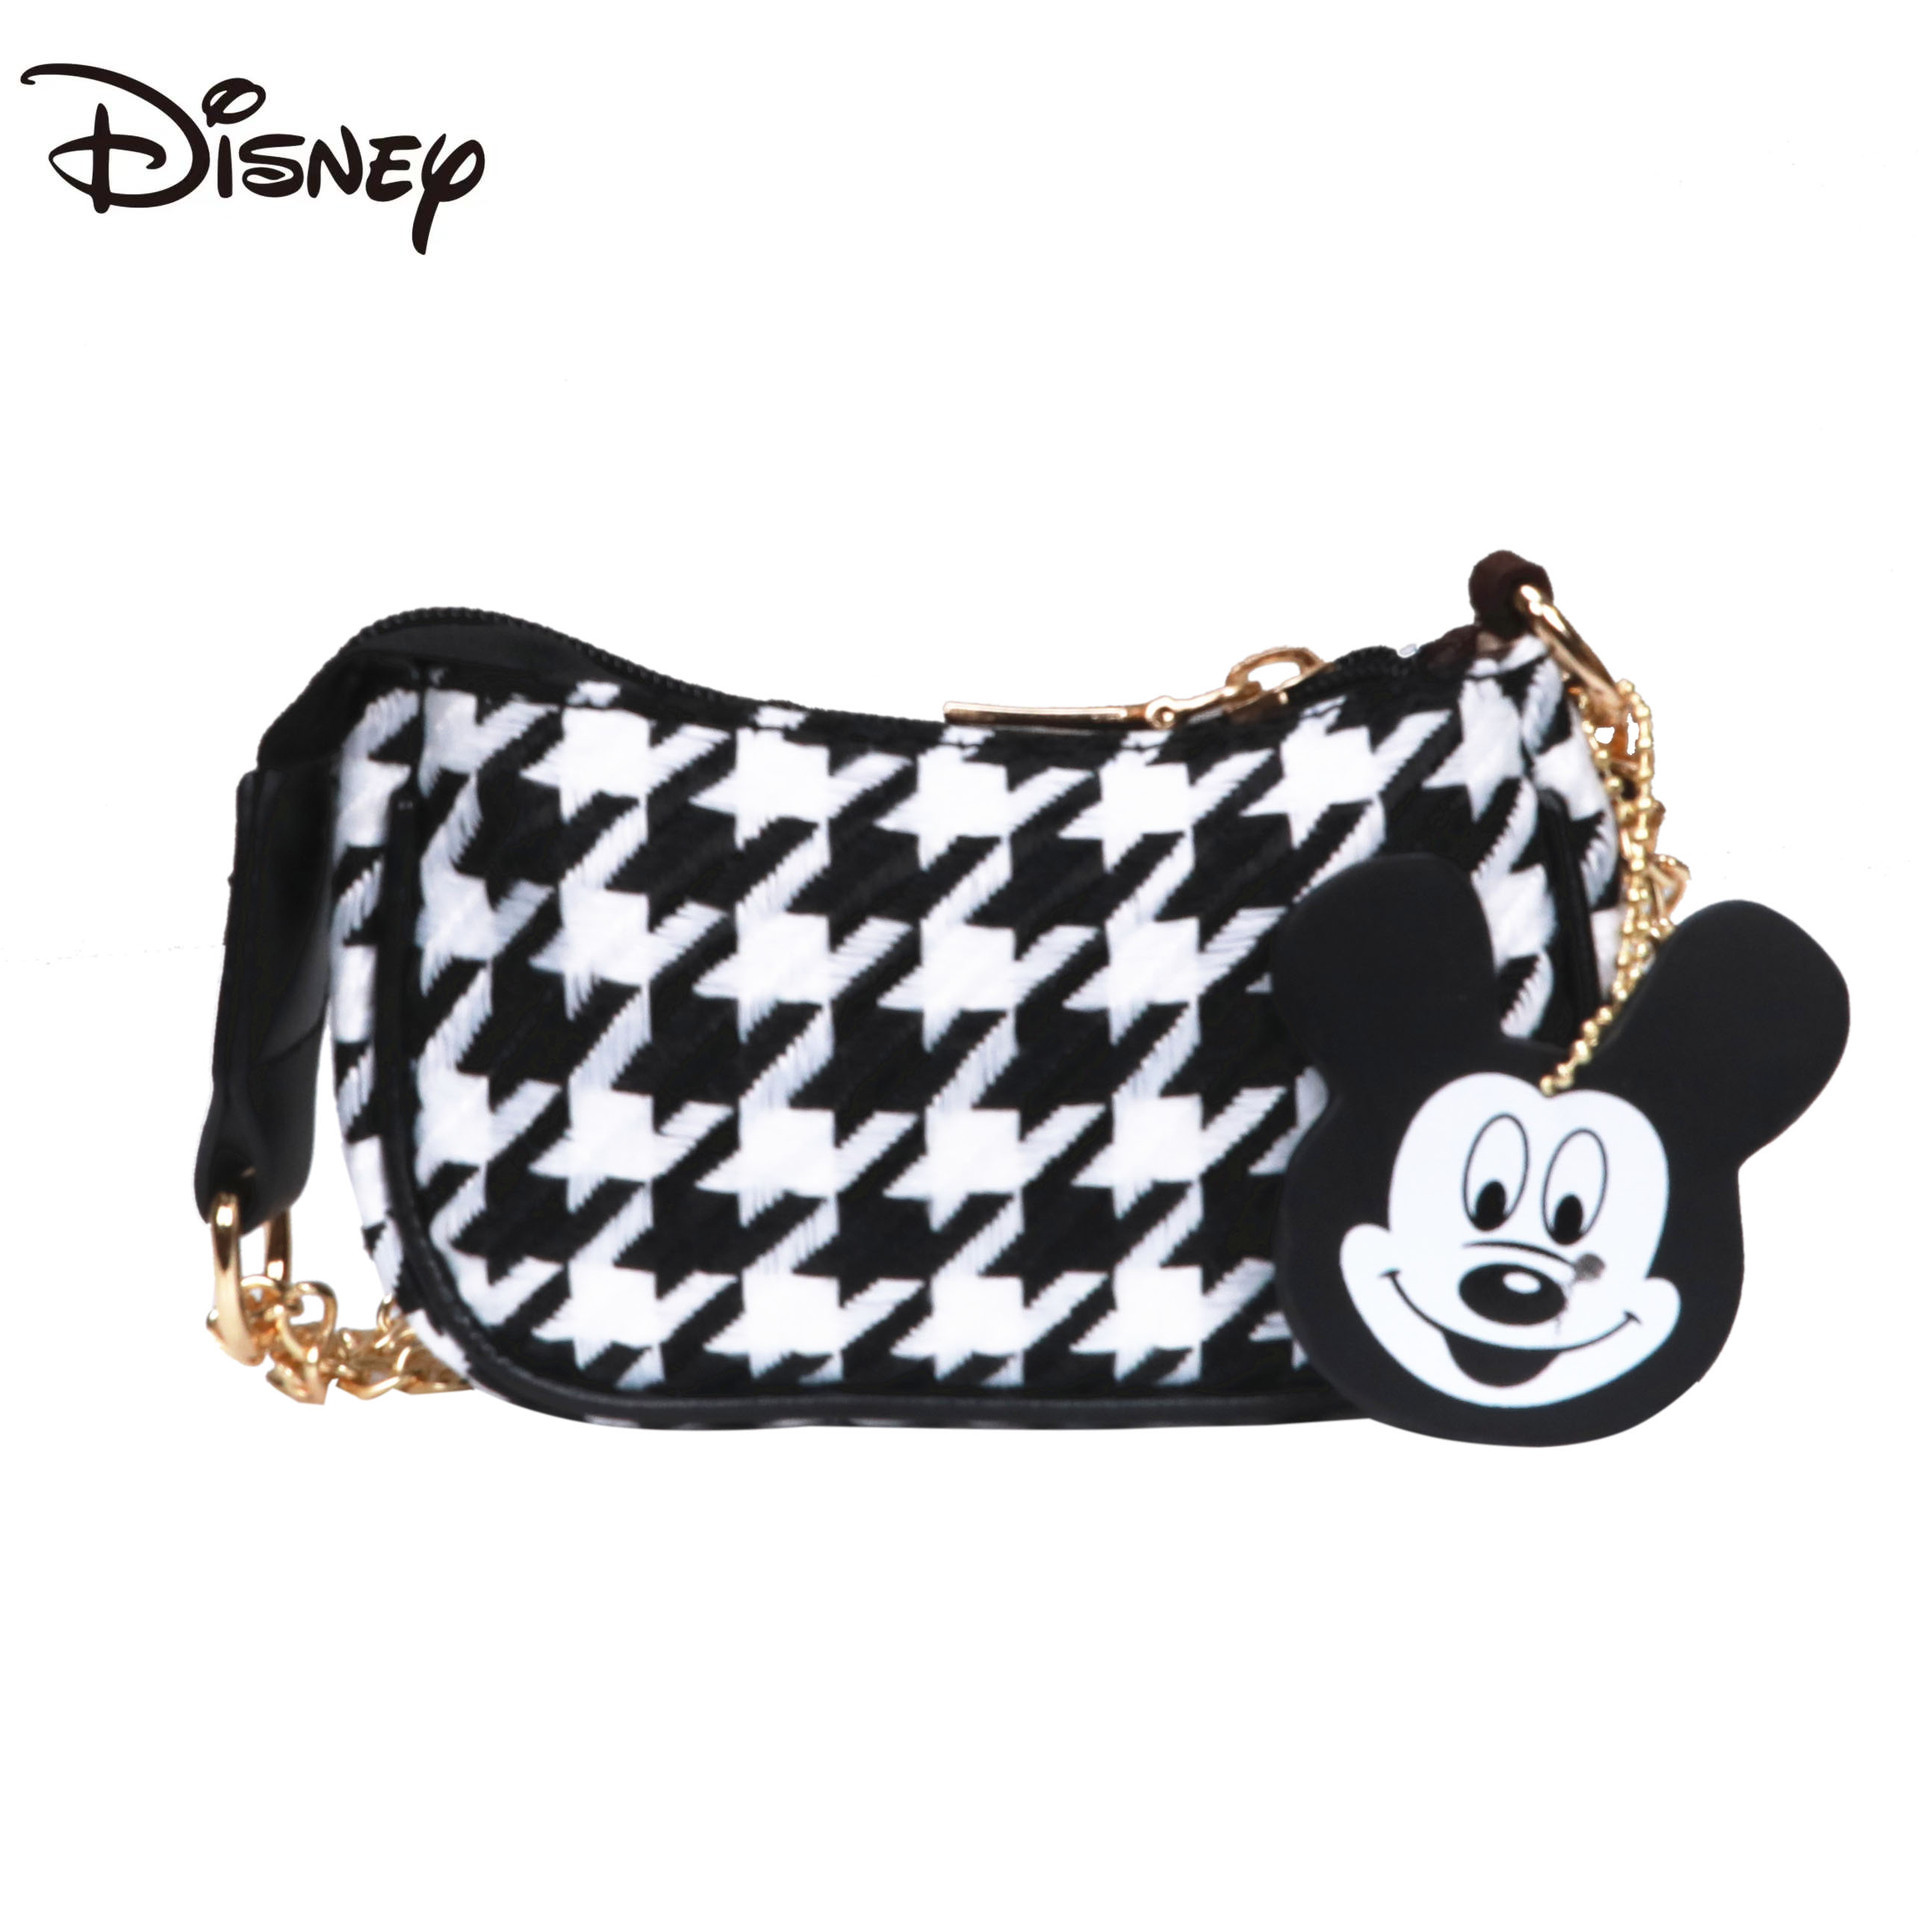 New Disney Cute Cartoon Girls One-shoulder Messenger Bag Large-capacity Multi-function Storage Bag Fashion Casual Girl Wallet